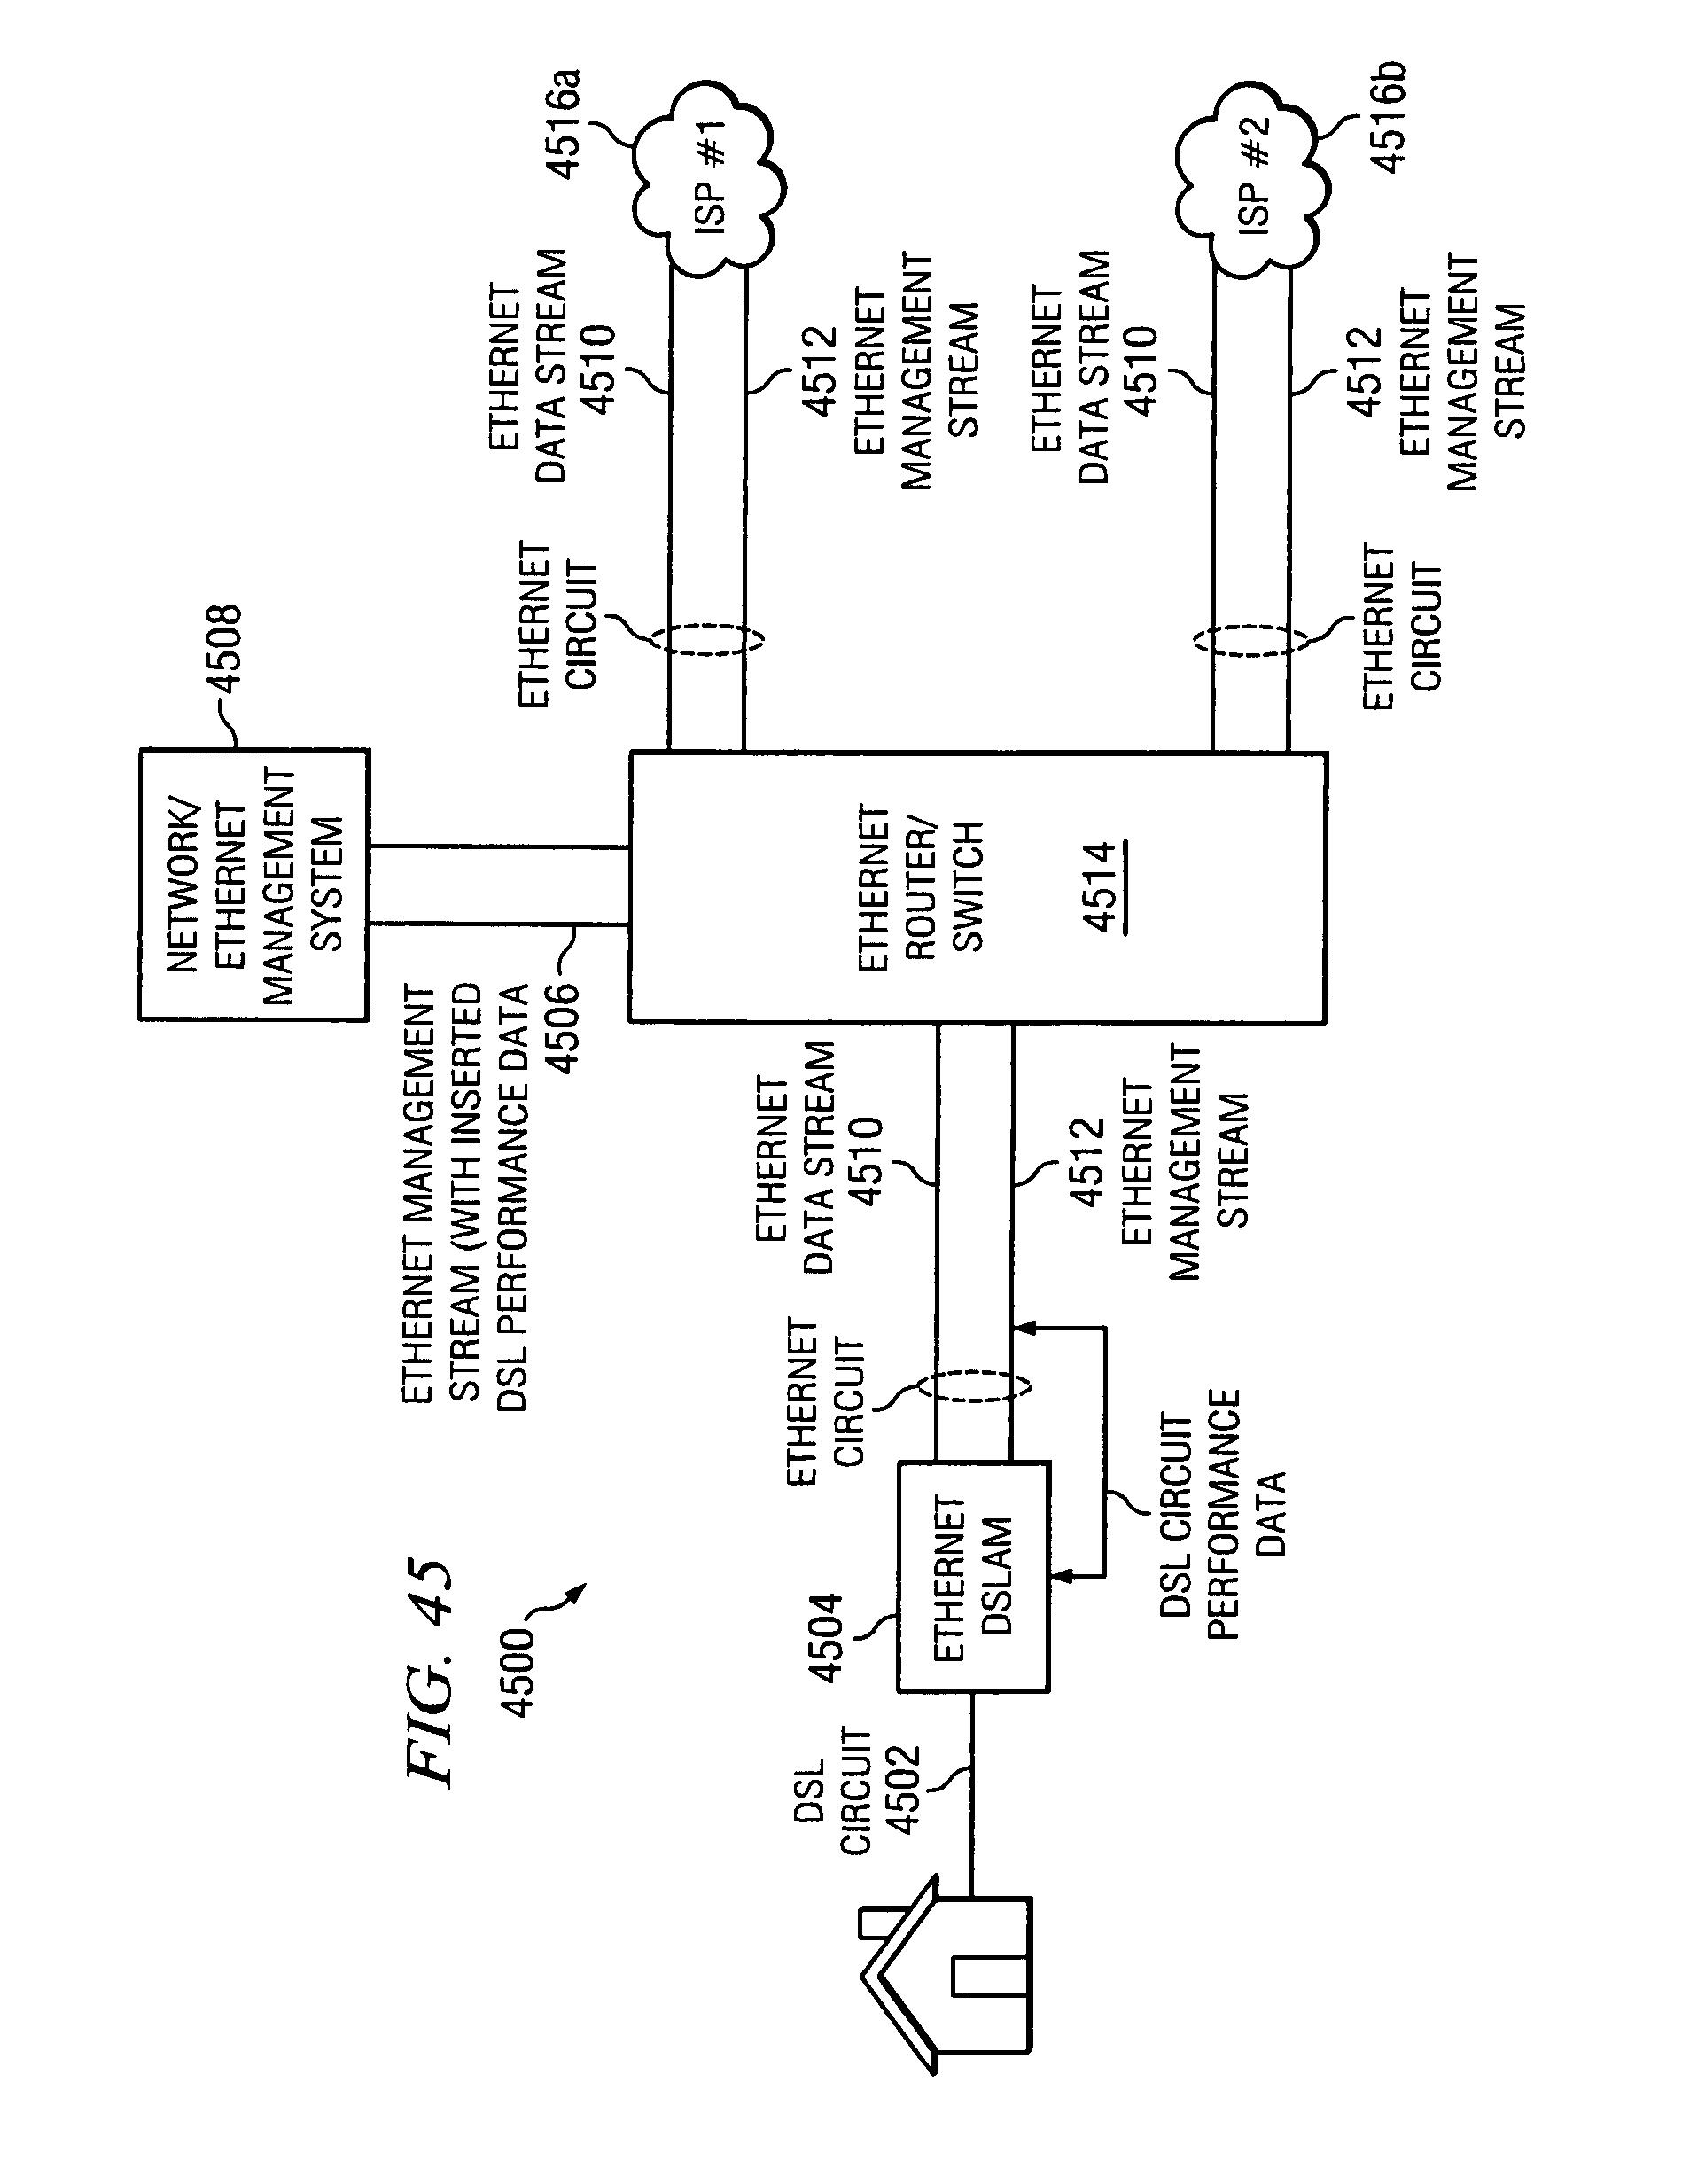 Patent Us 8228791 B2 2674 International Wiring Diagrams Model 0 Petitions